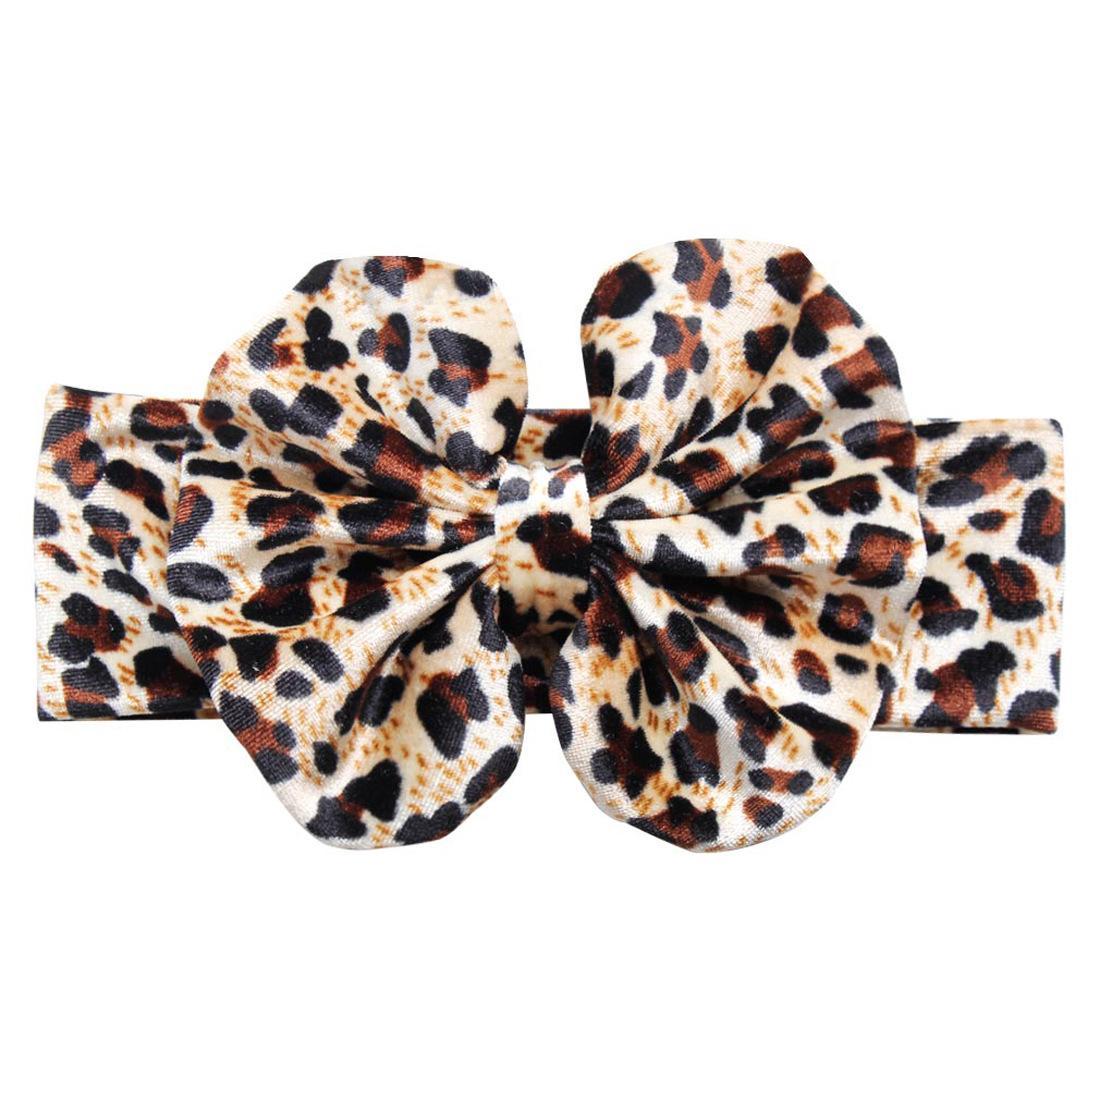 "1PC Retail New Summer Leopard Velet 5"" European Photography Hair Bow Elastic Headband DIY Hair Accessories Headwear"